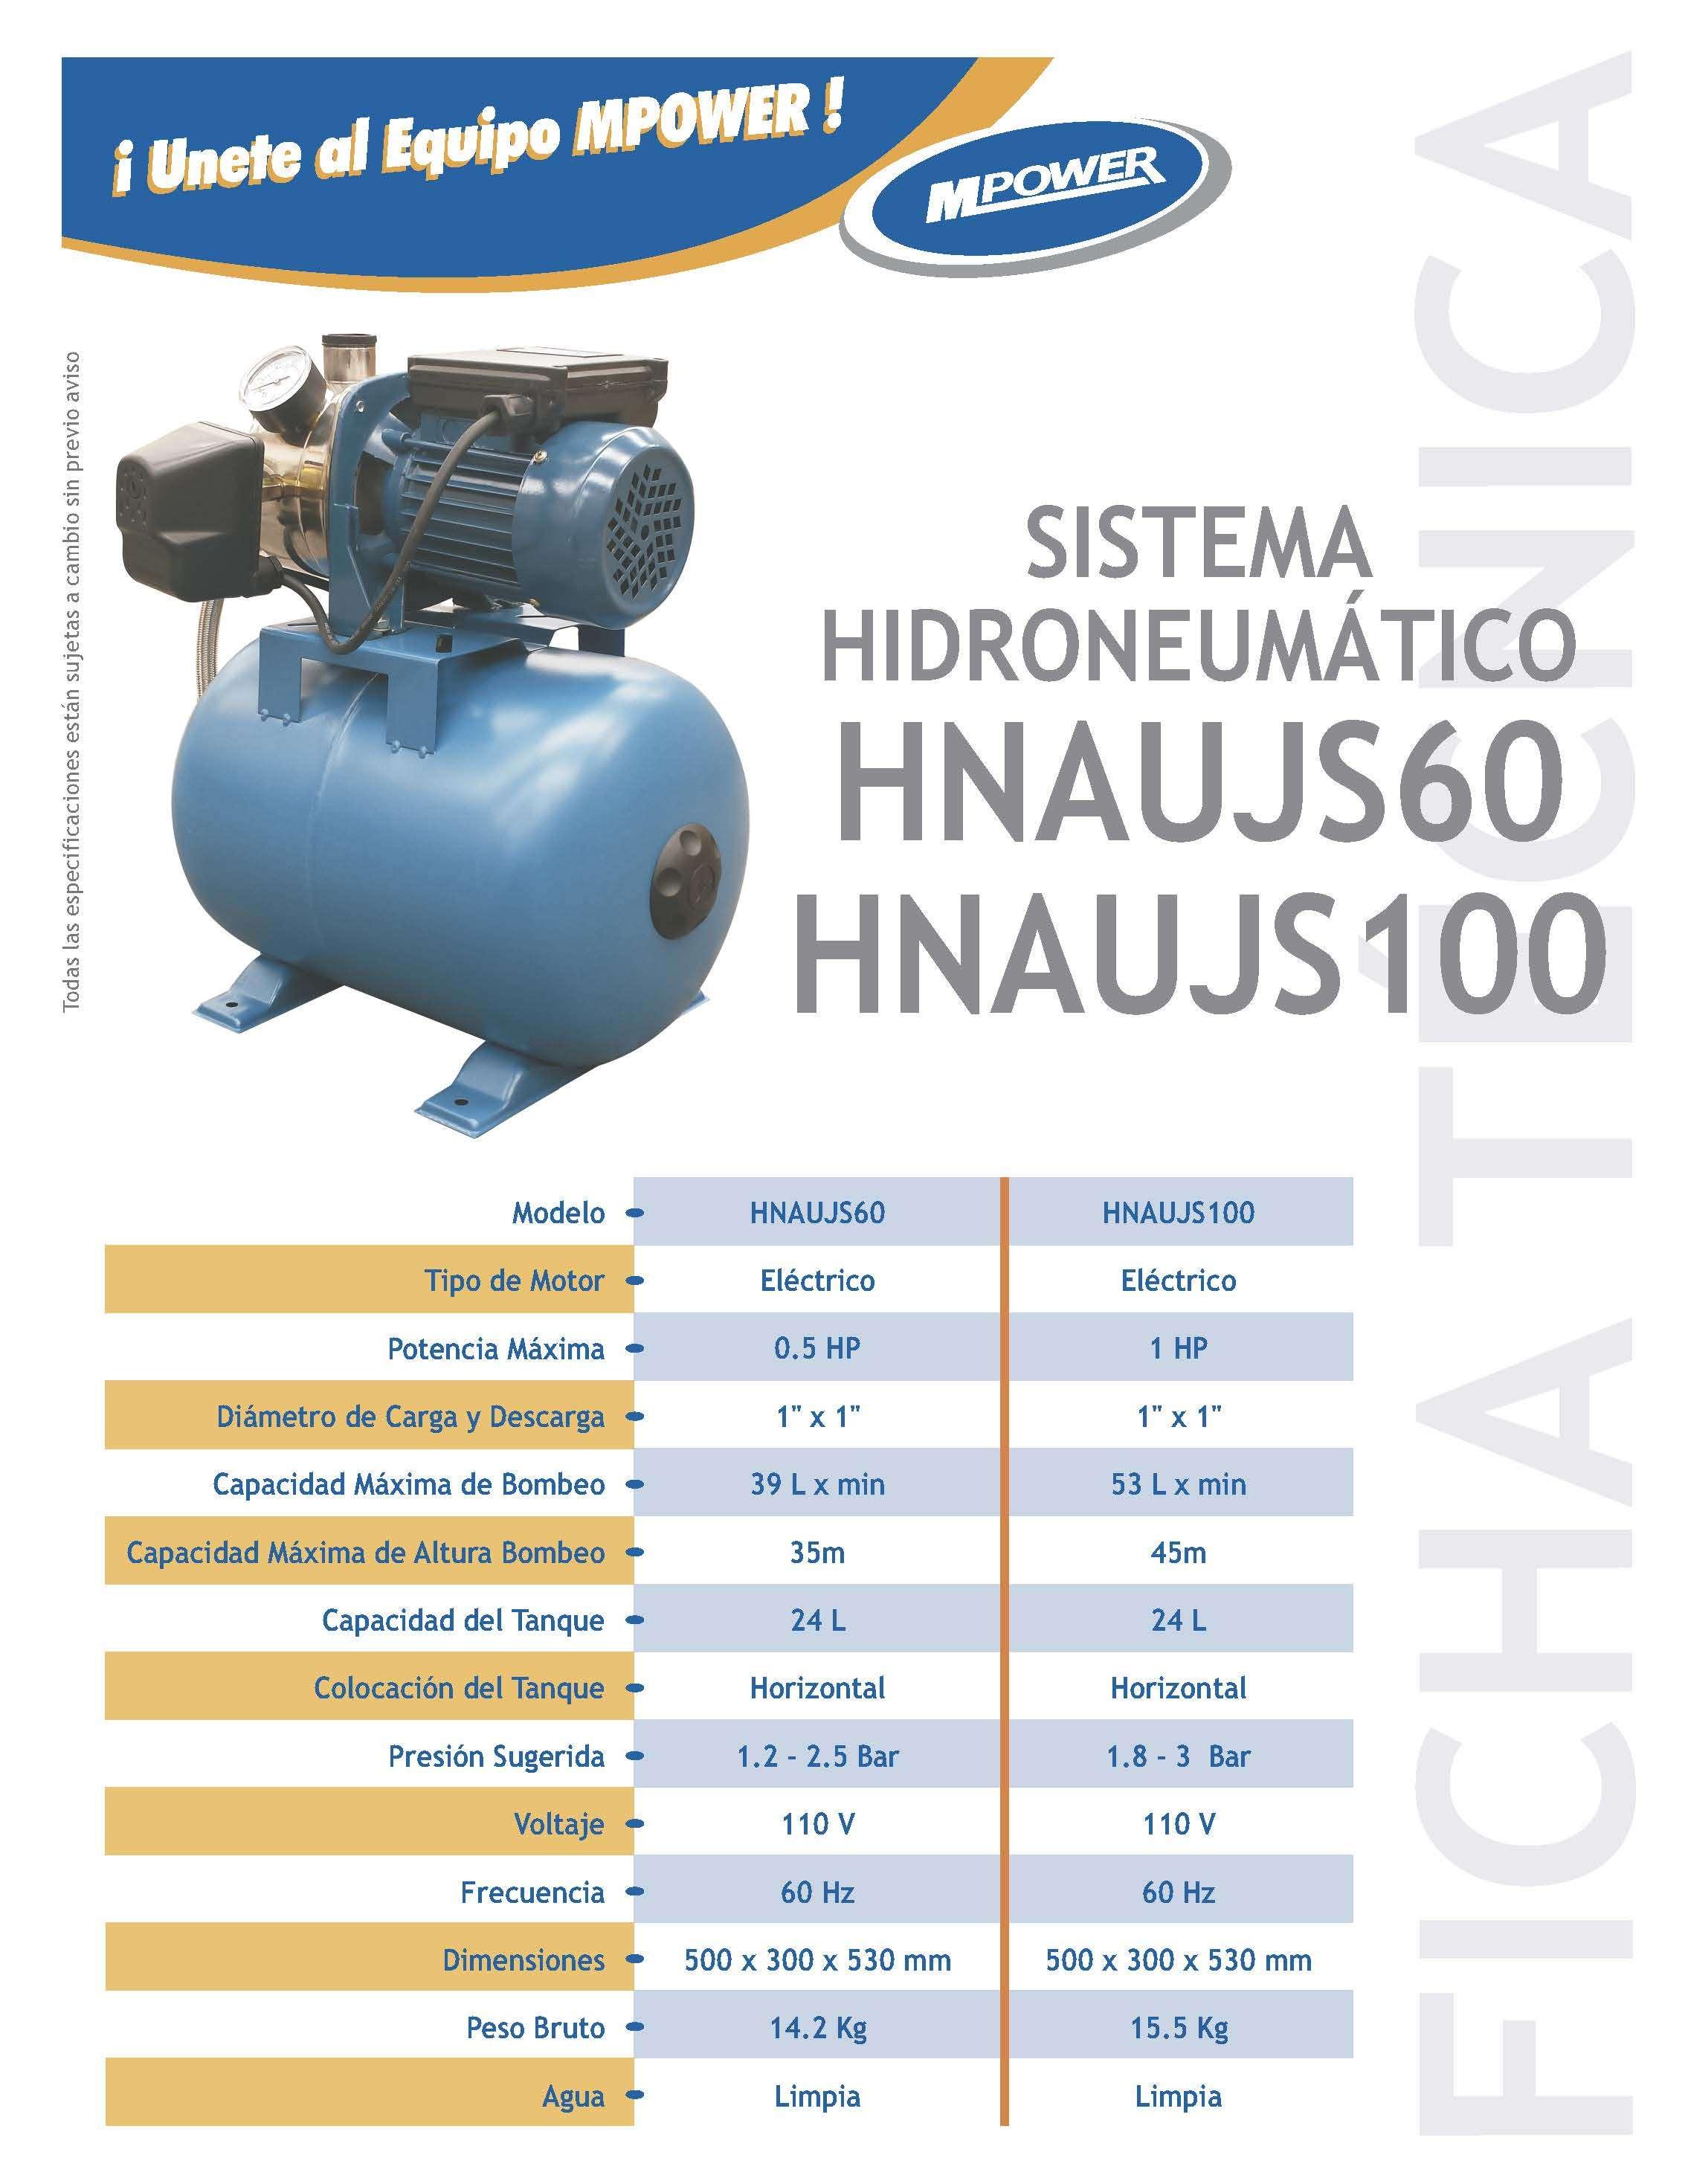 Bomba tipo jet 0 5 hp 110v para hidroneumatico mpower for Precio de hidroneumatico